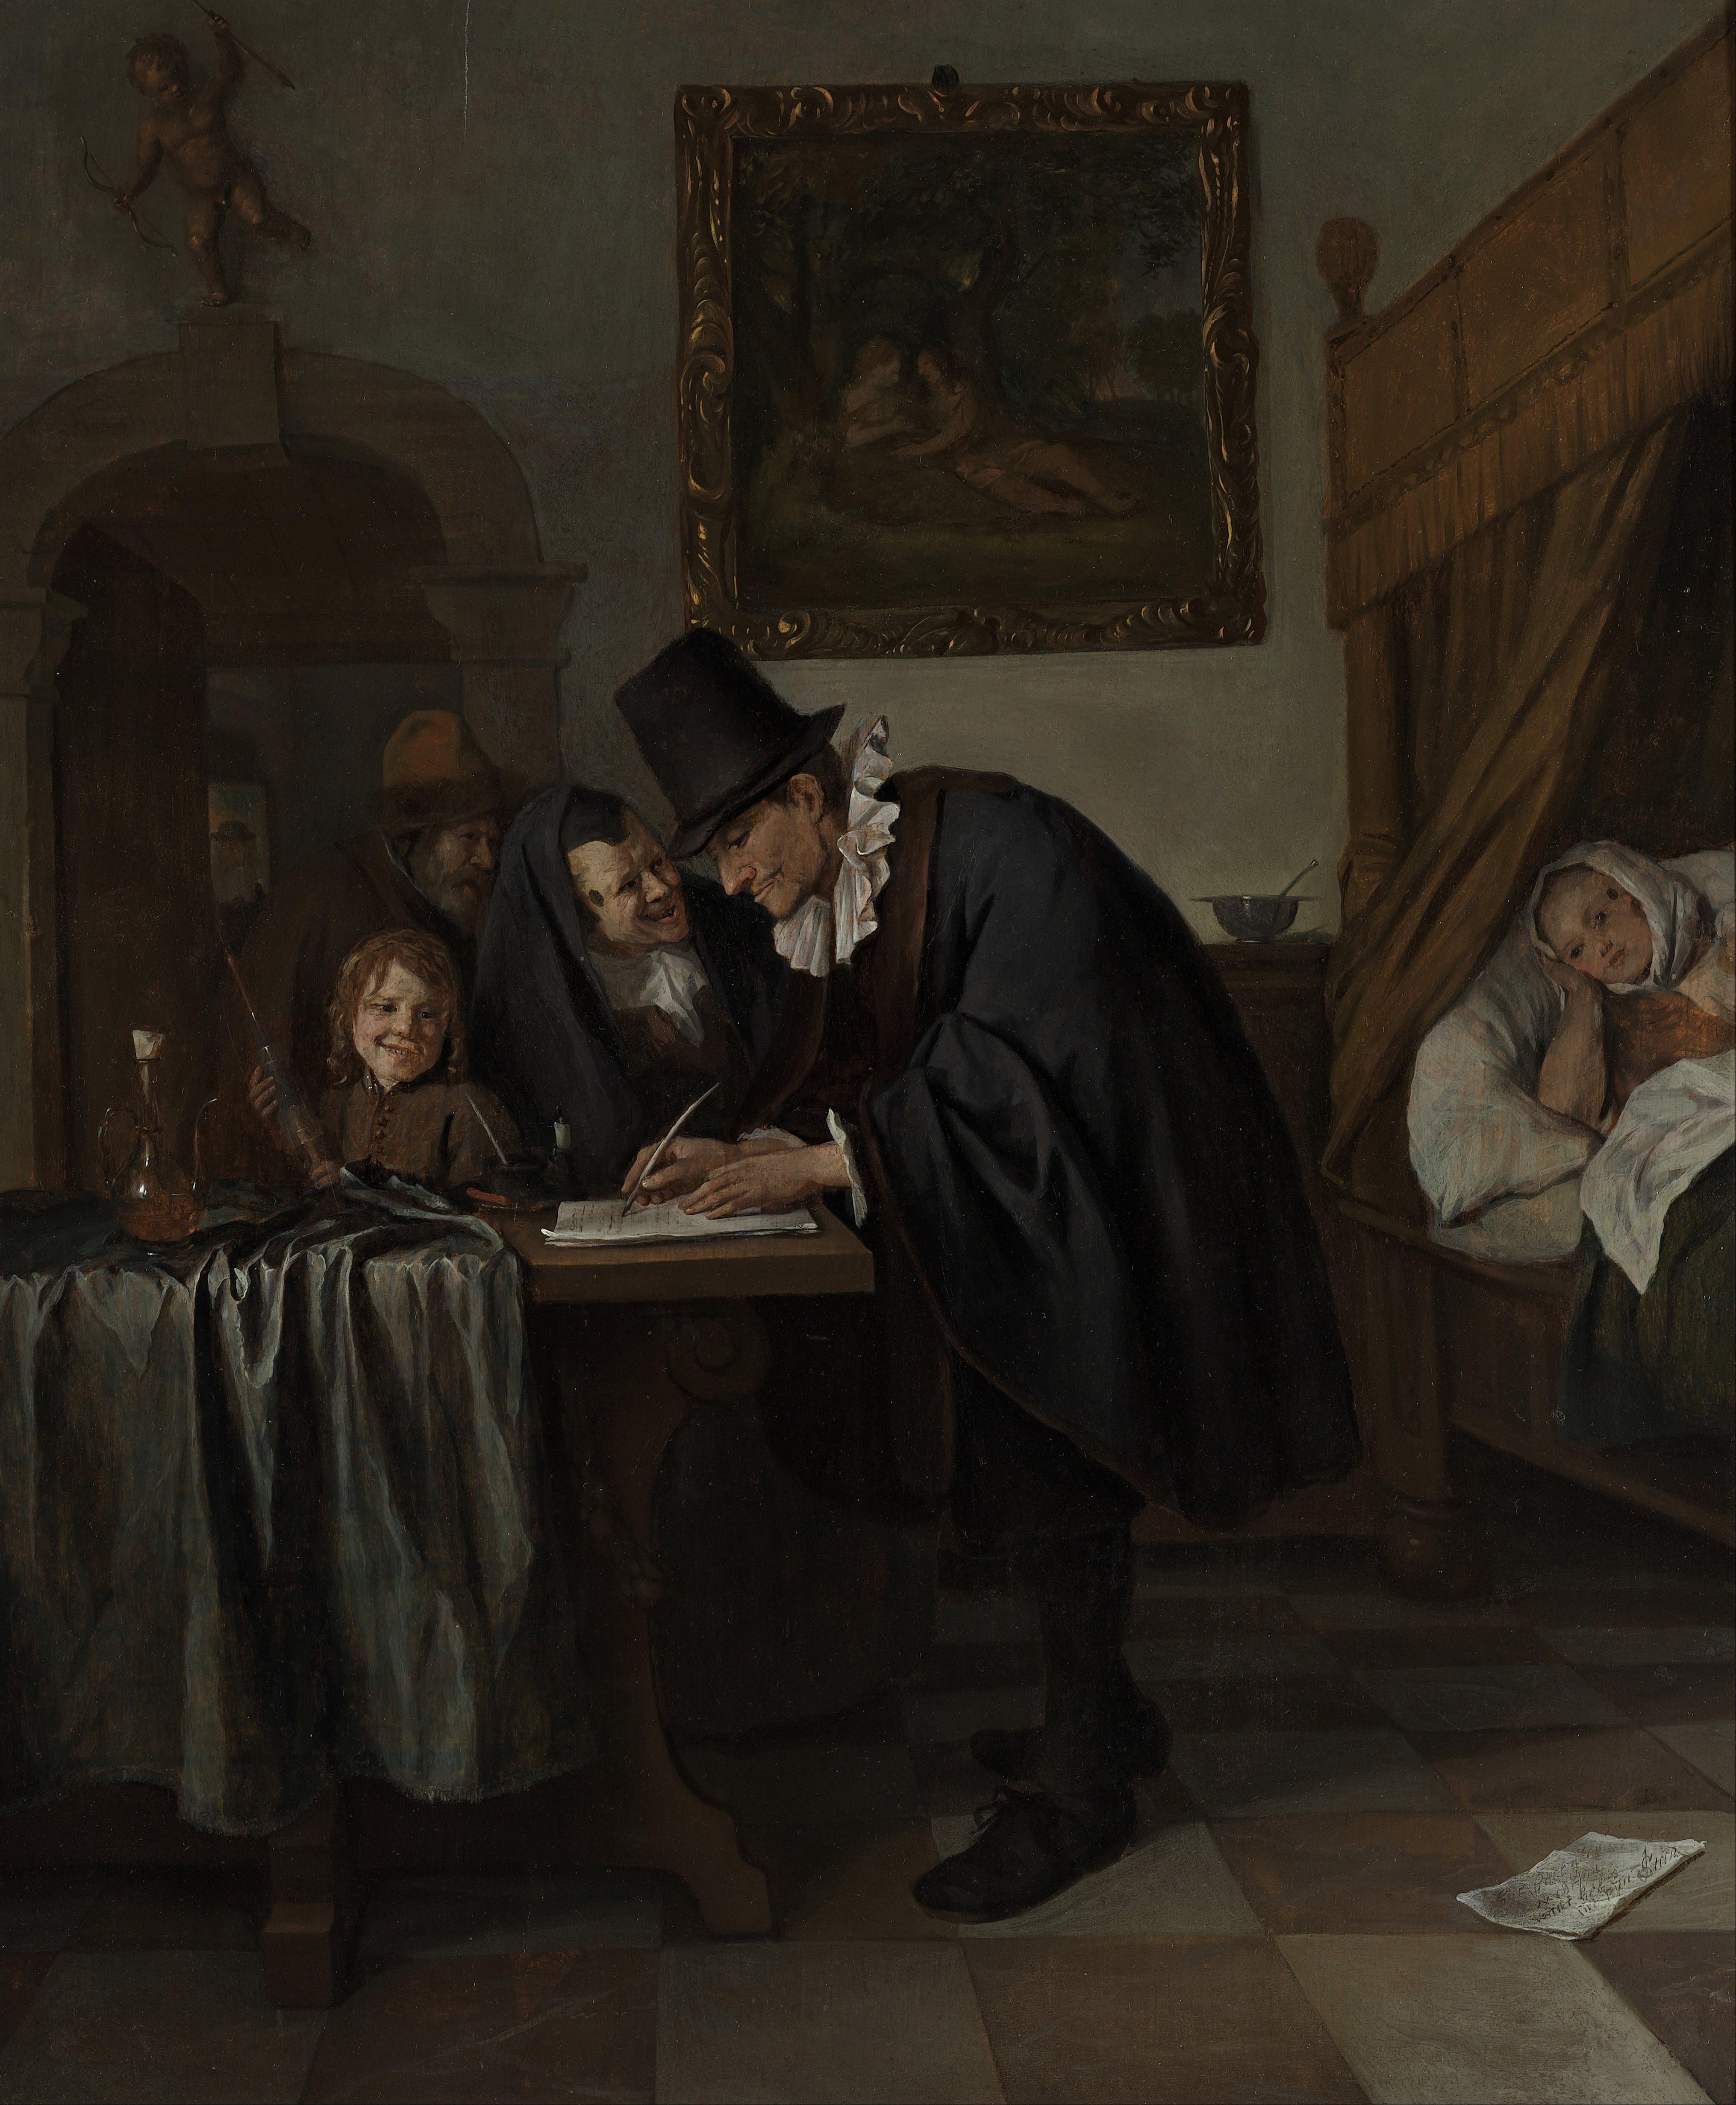 Jan_Havicksz._Steen_-_The_Doctor's_Visit 1665.jpg